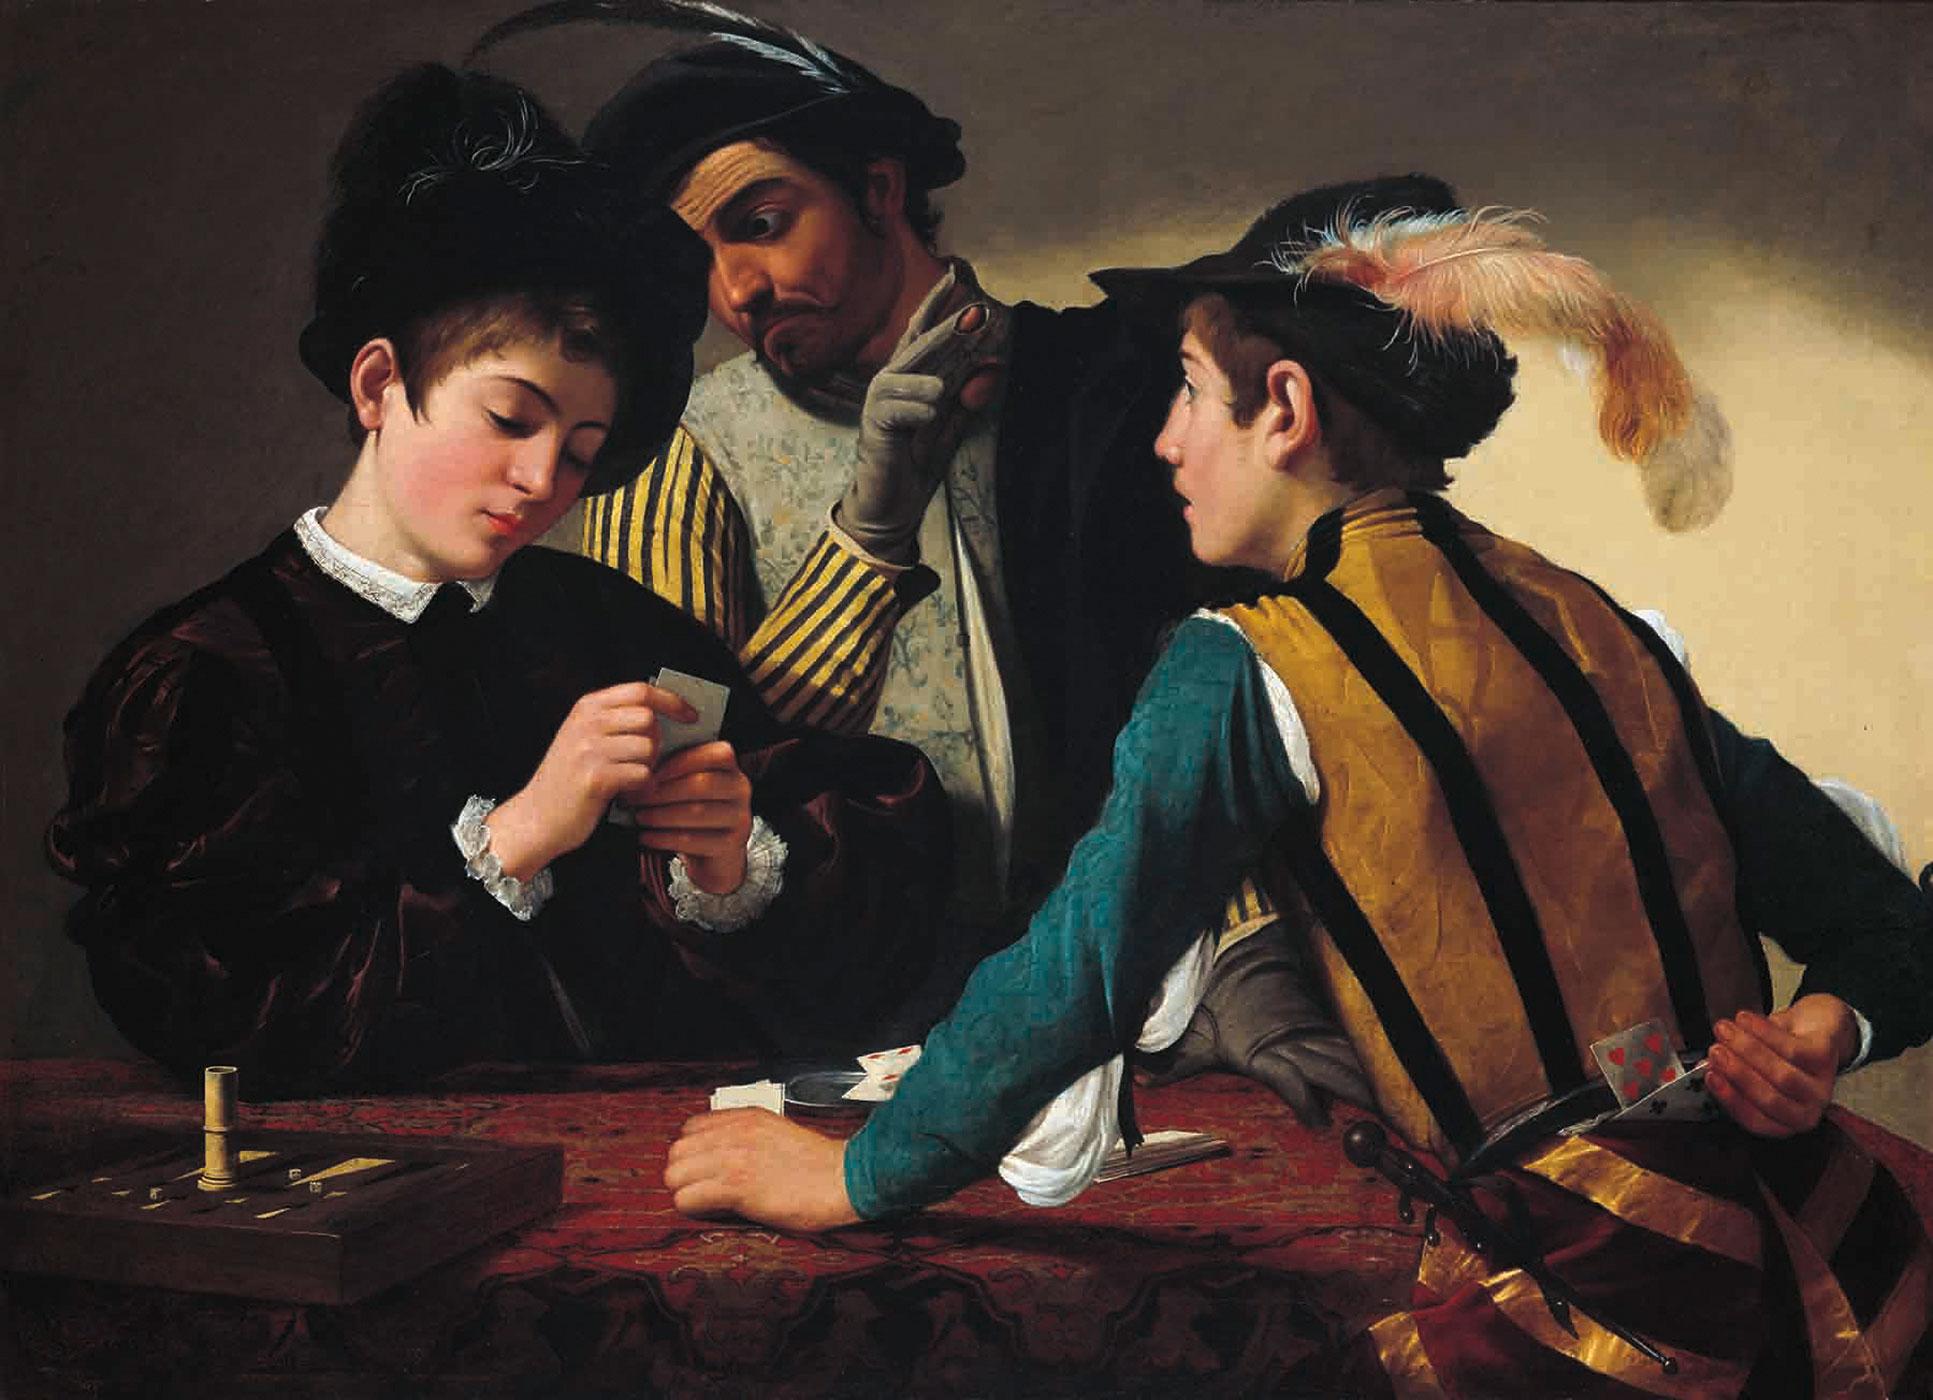 Caravaggio's The Cardsharps